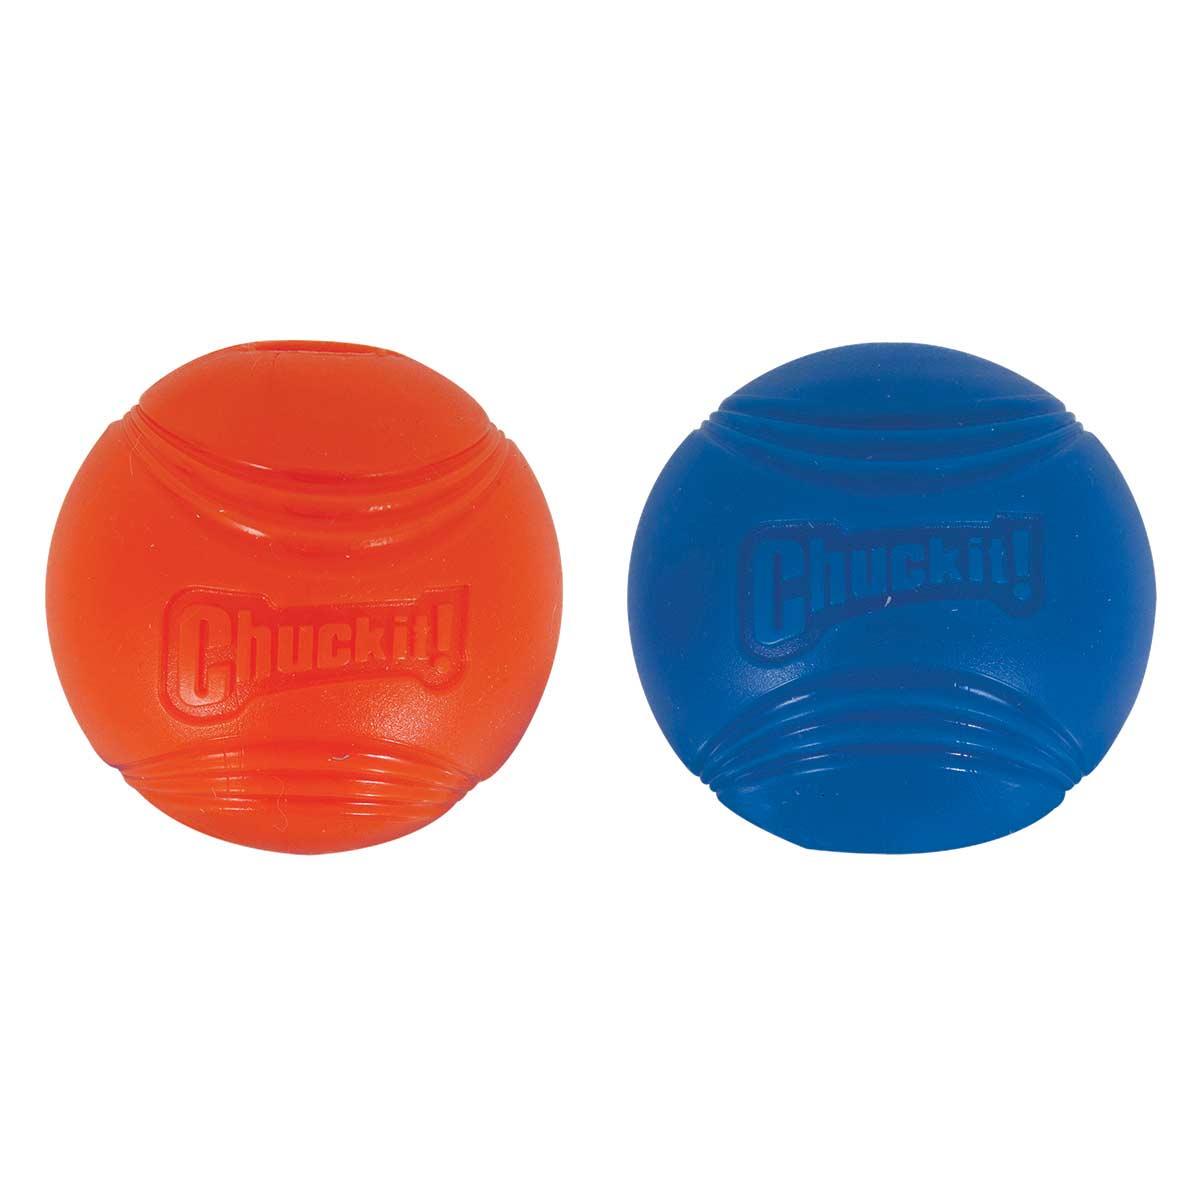 Chuckit! Strato Ball 2 Pack Medium - Blue Ball, Orange Ball